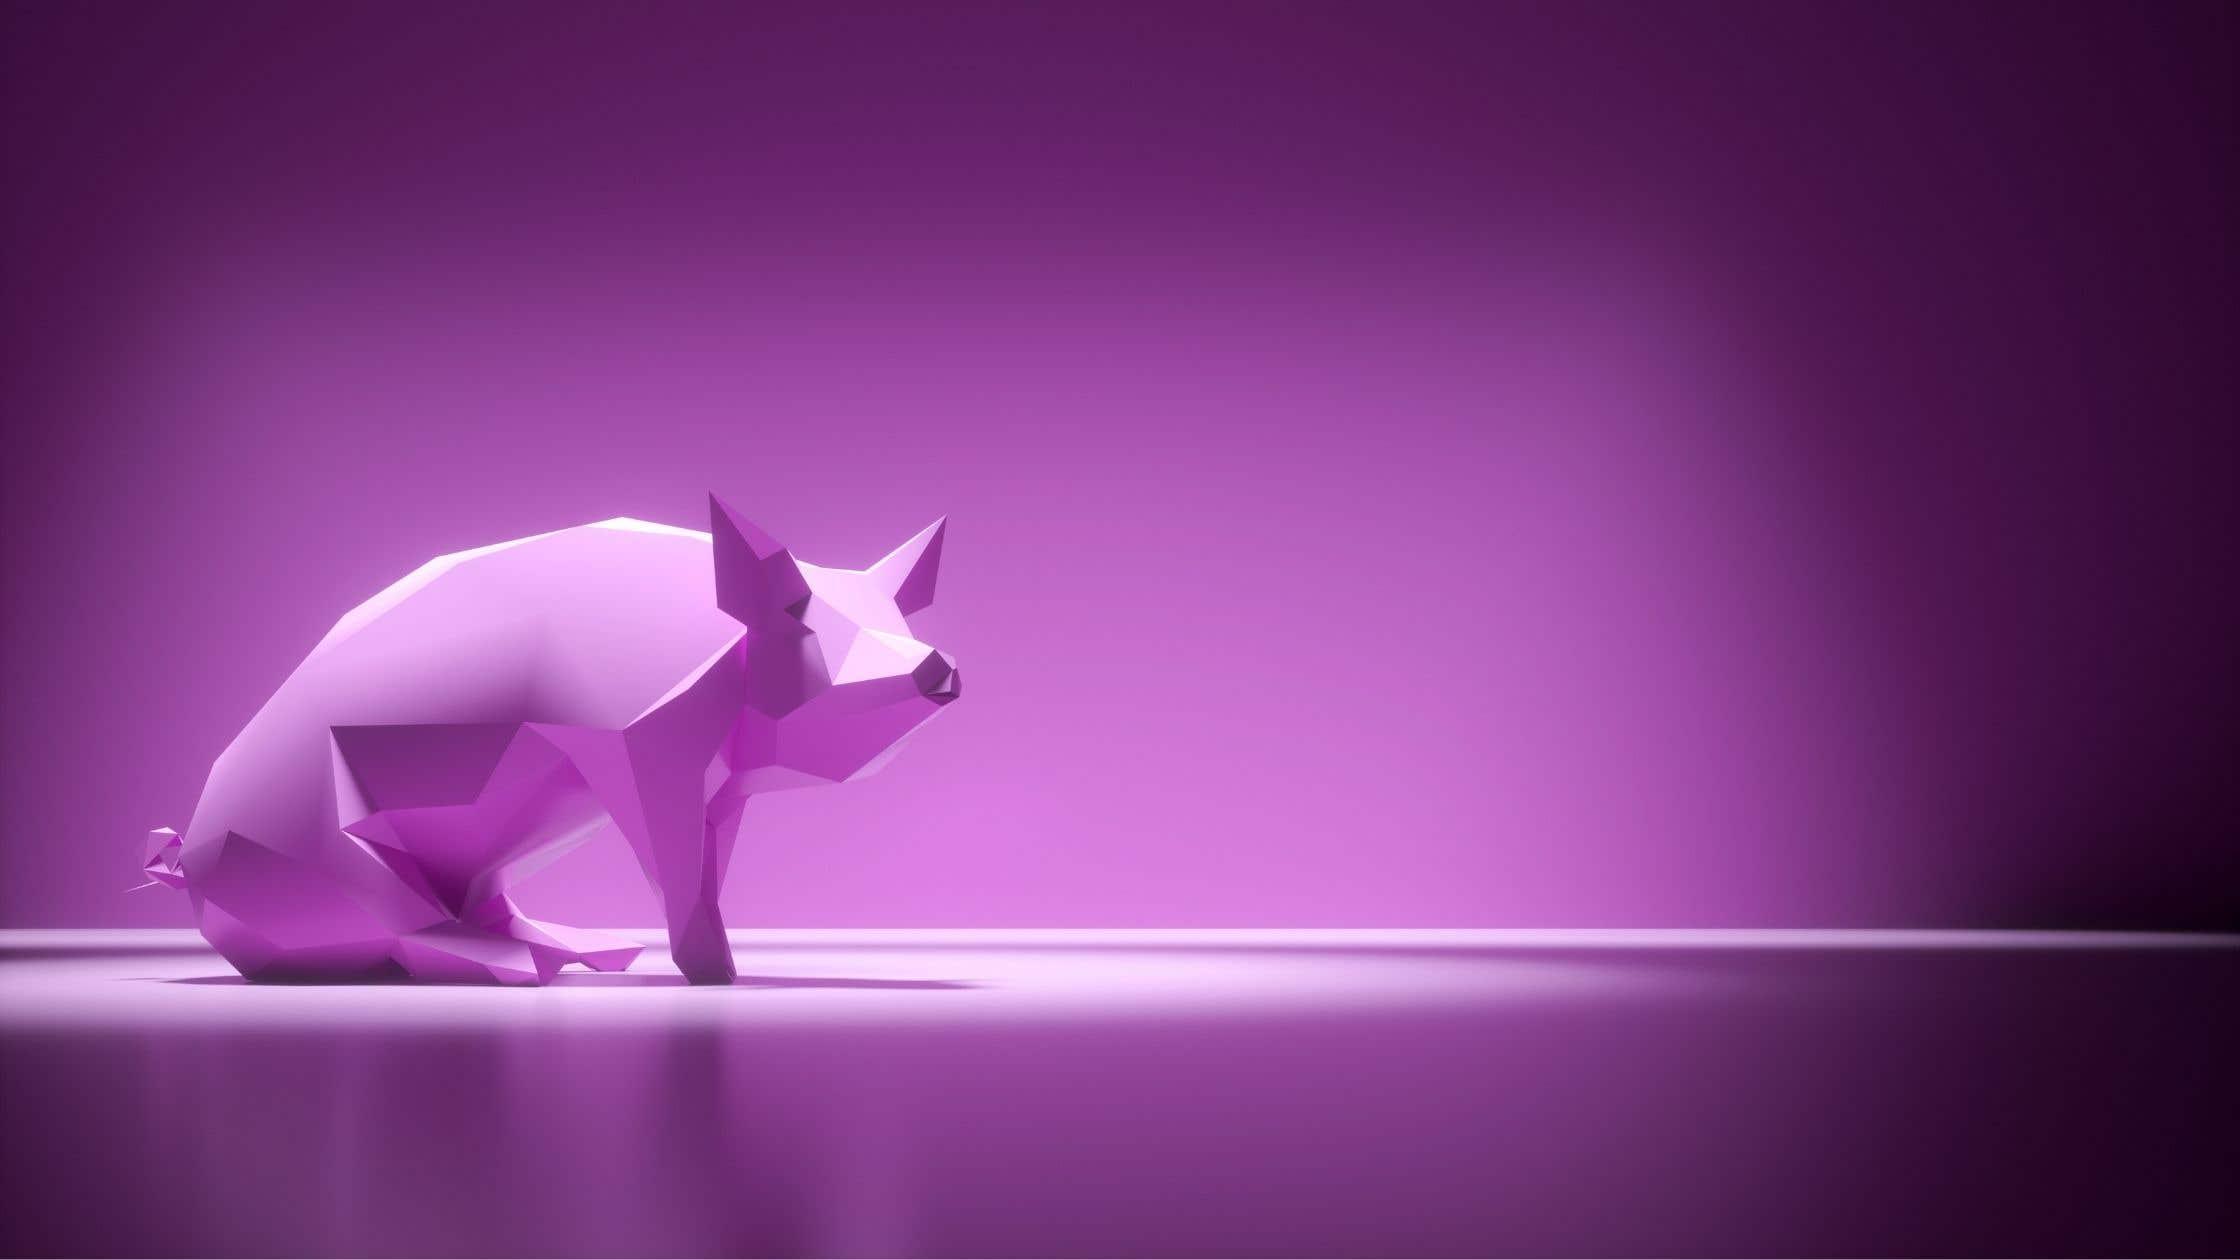 Pig low poly art